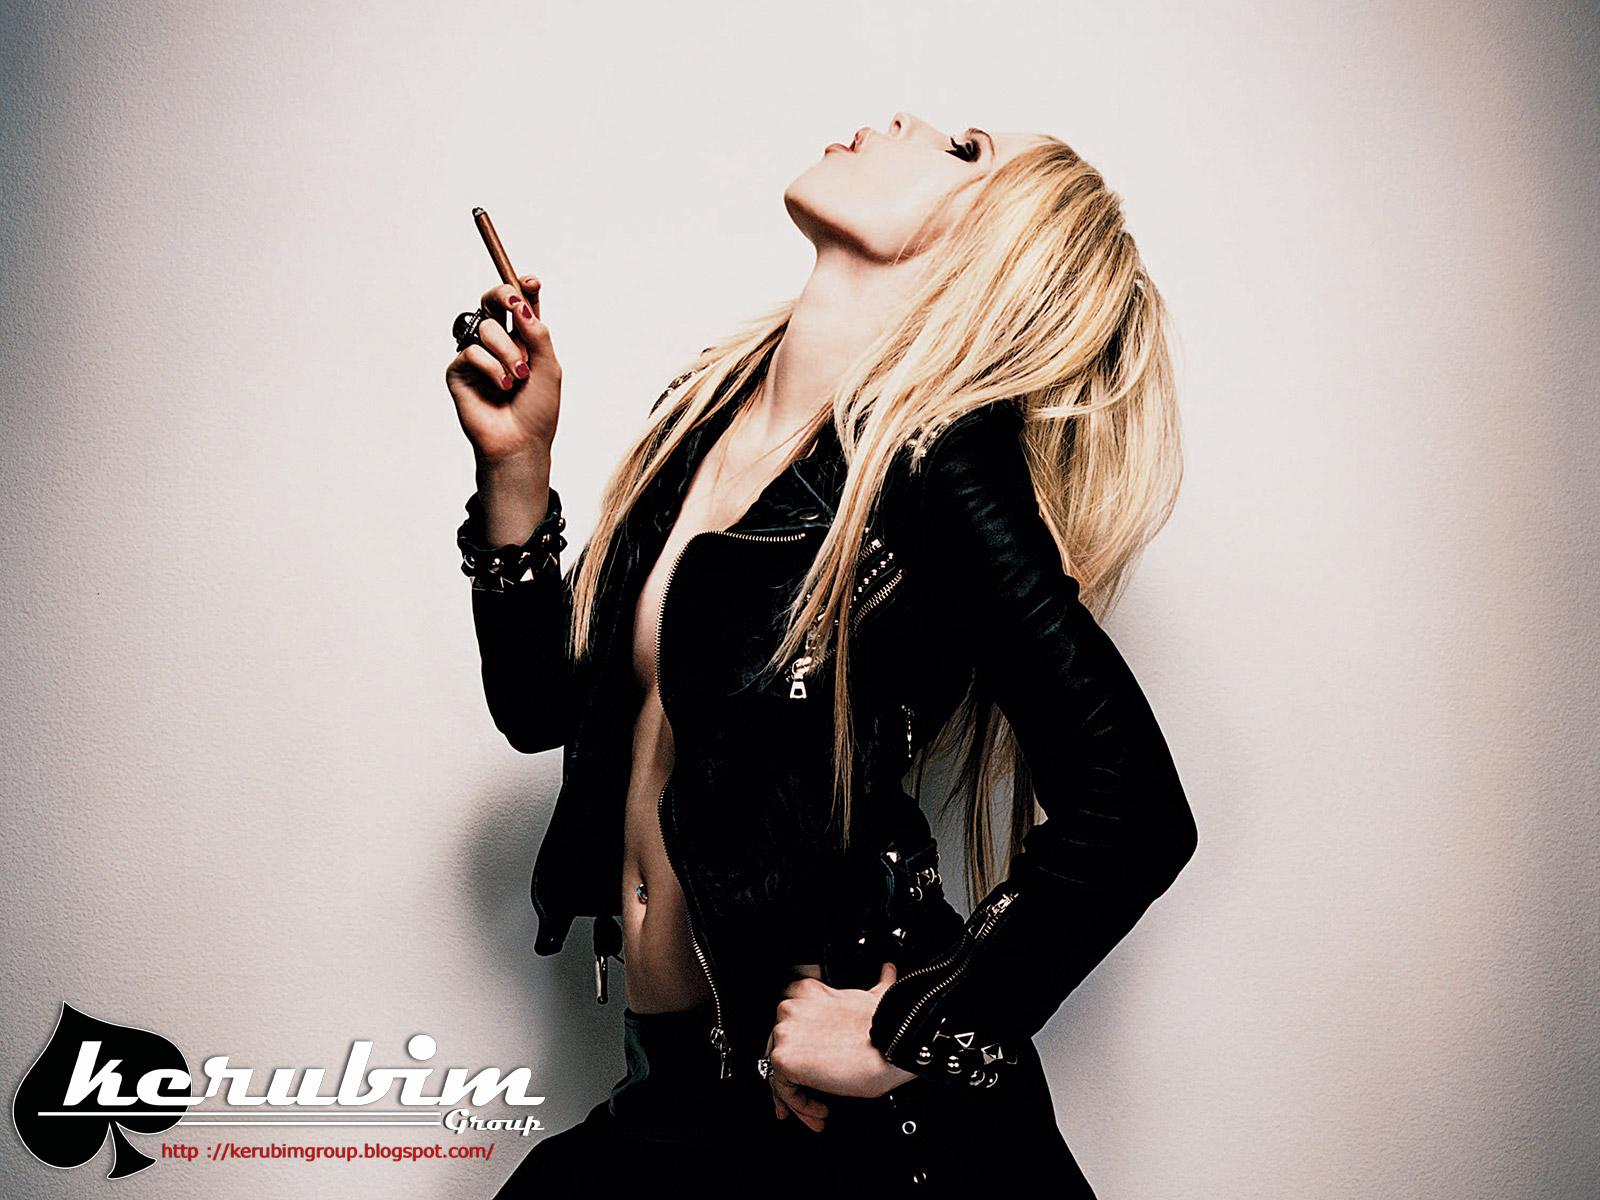 http://2.bp.blogspot.com/-Ihzpwm1uZNo/T221bZeOWfI/AAAAAAAAAM8/ENZMPiThz4o/s1600/Avril+Lavigne+smoking.jpg